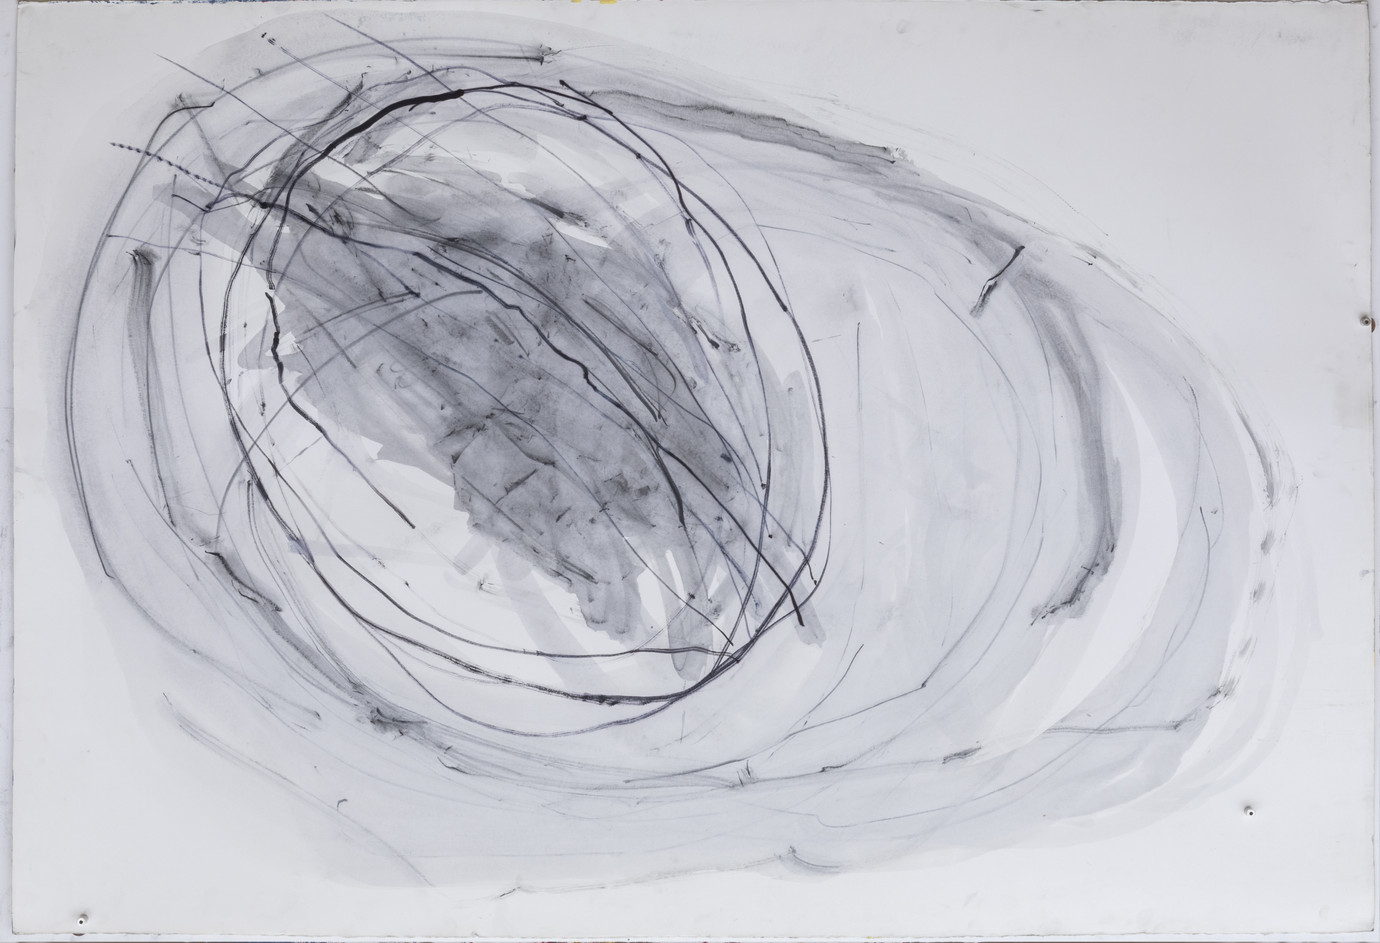 104 x 152 cm grafite, caneta marcador sobre papel foto: Ruy Teixeira